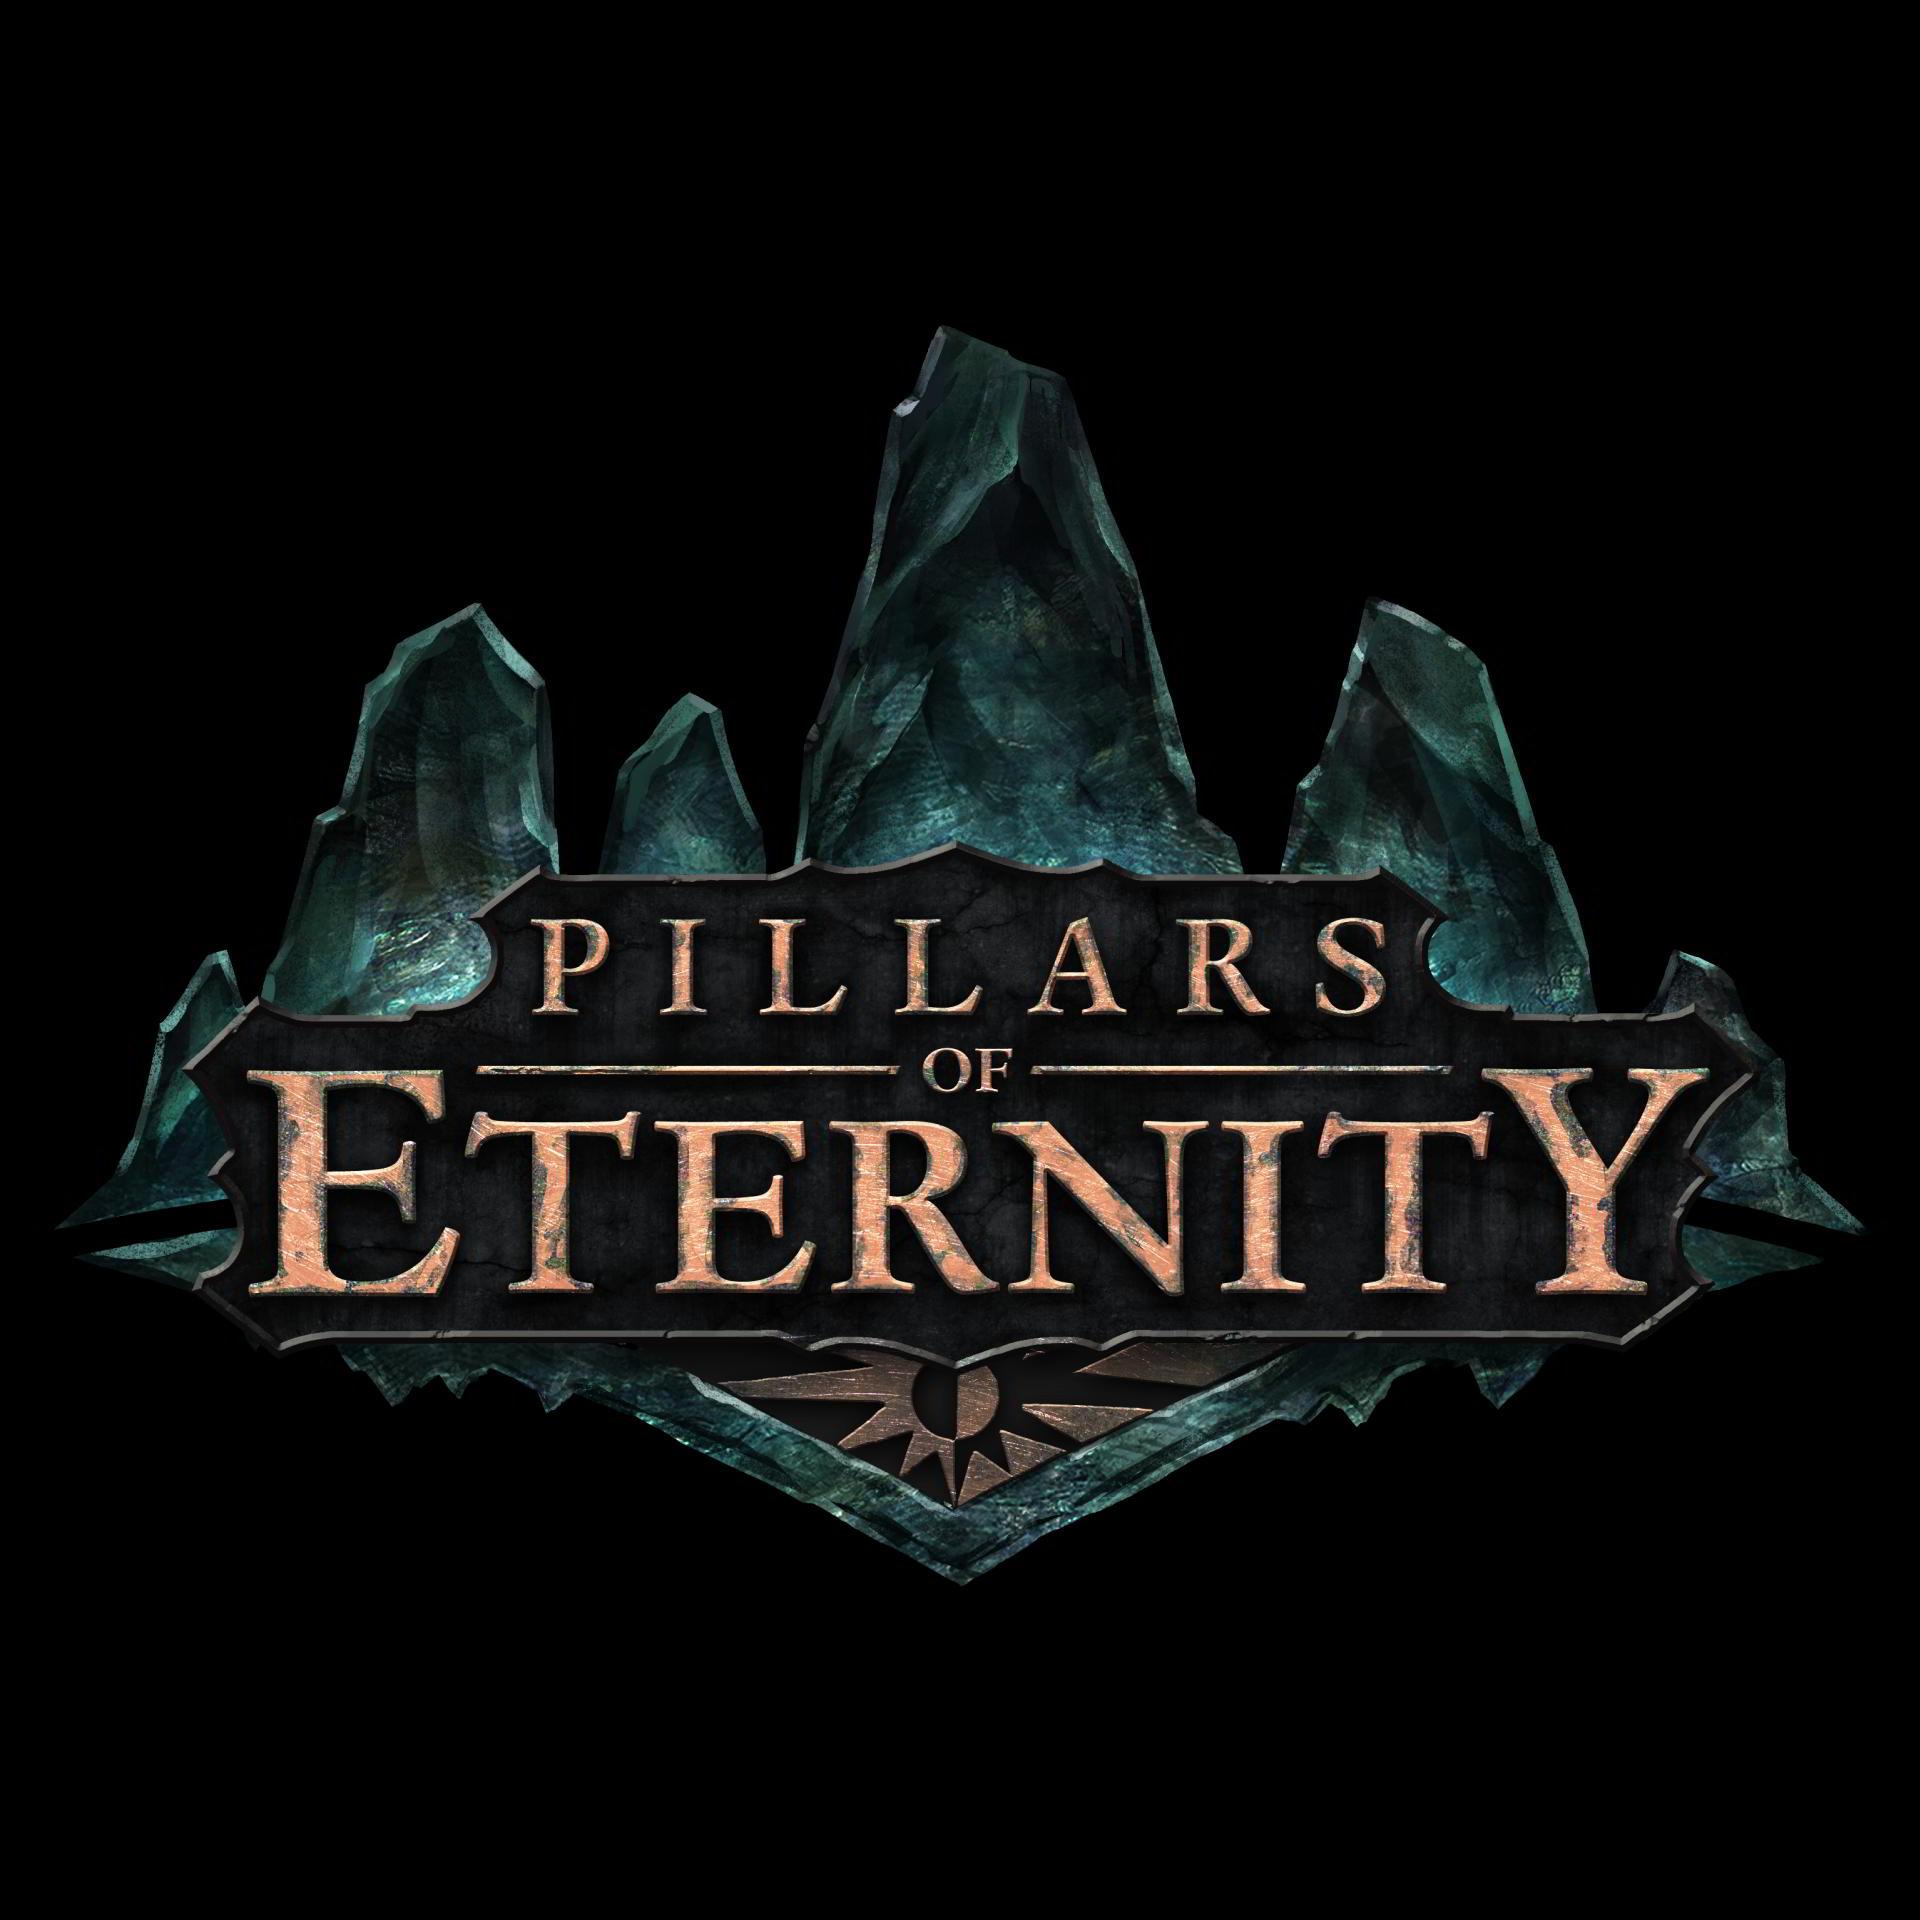 pillarsofeternity-logo